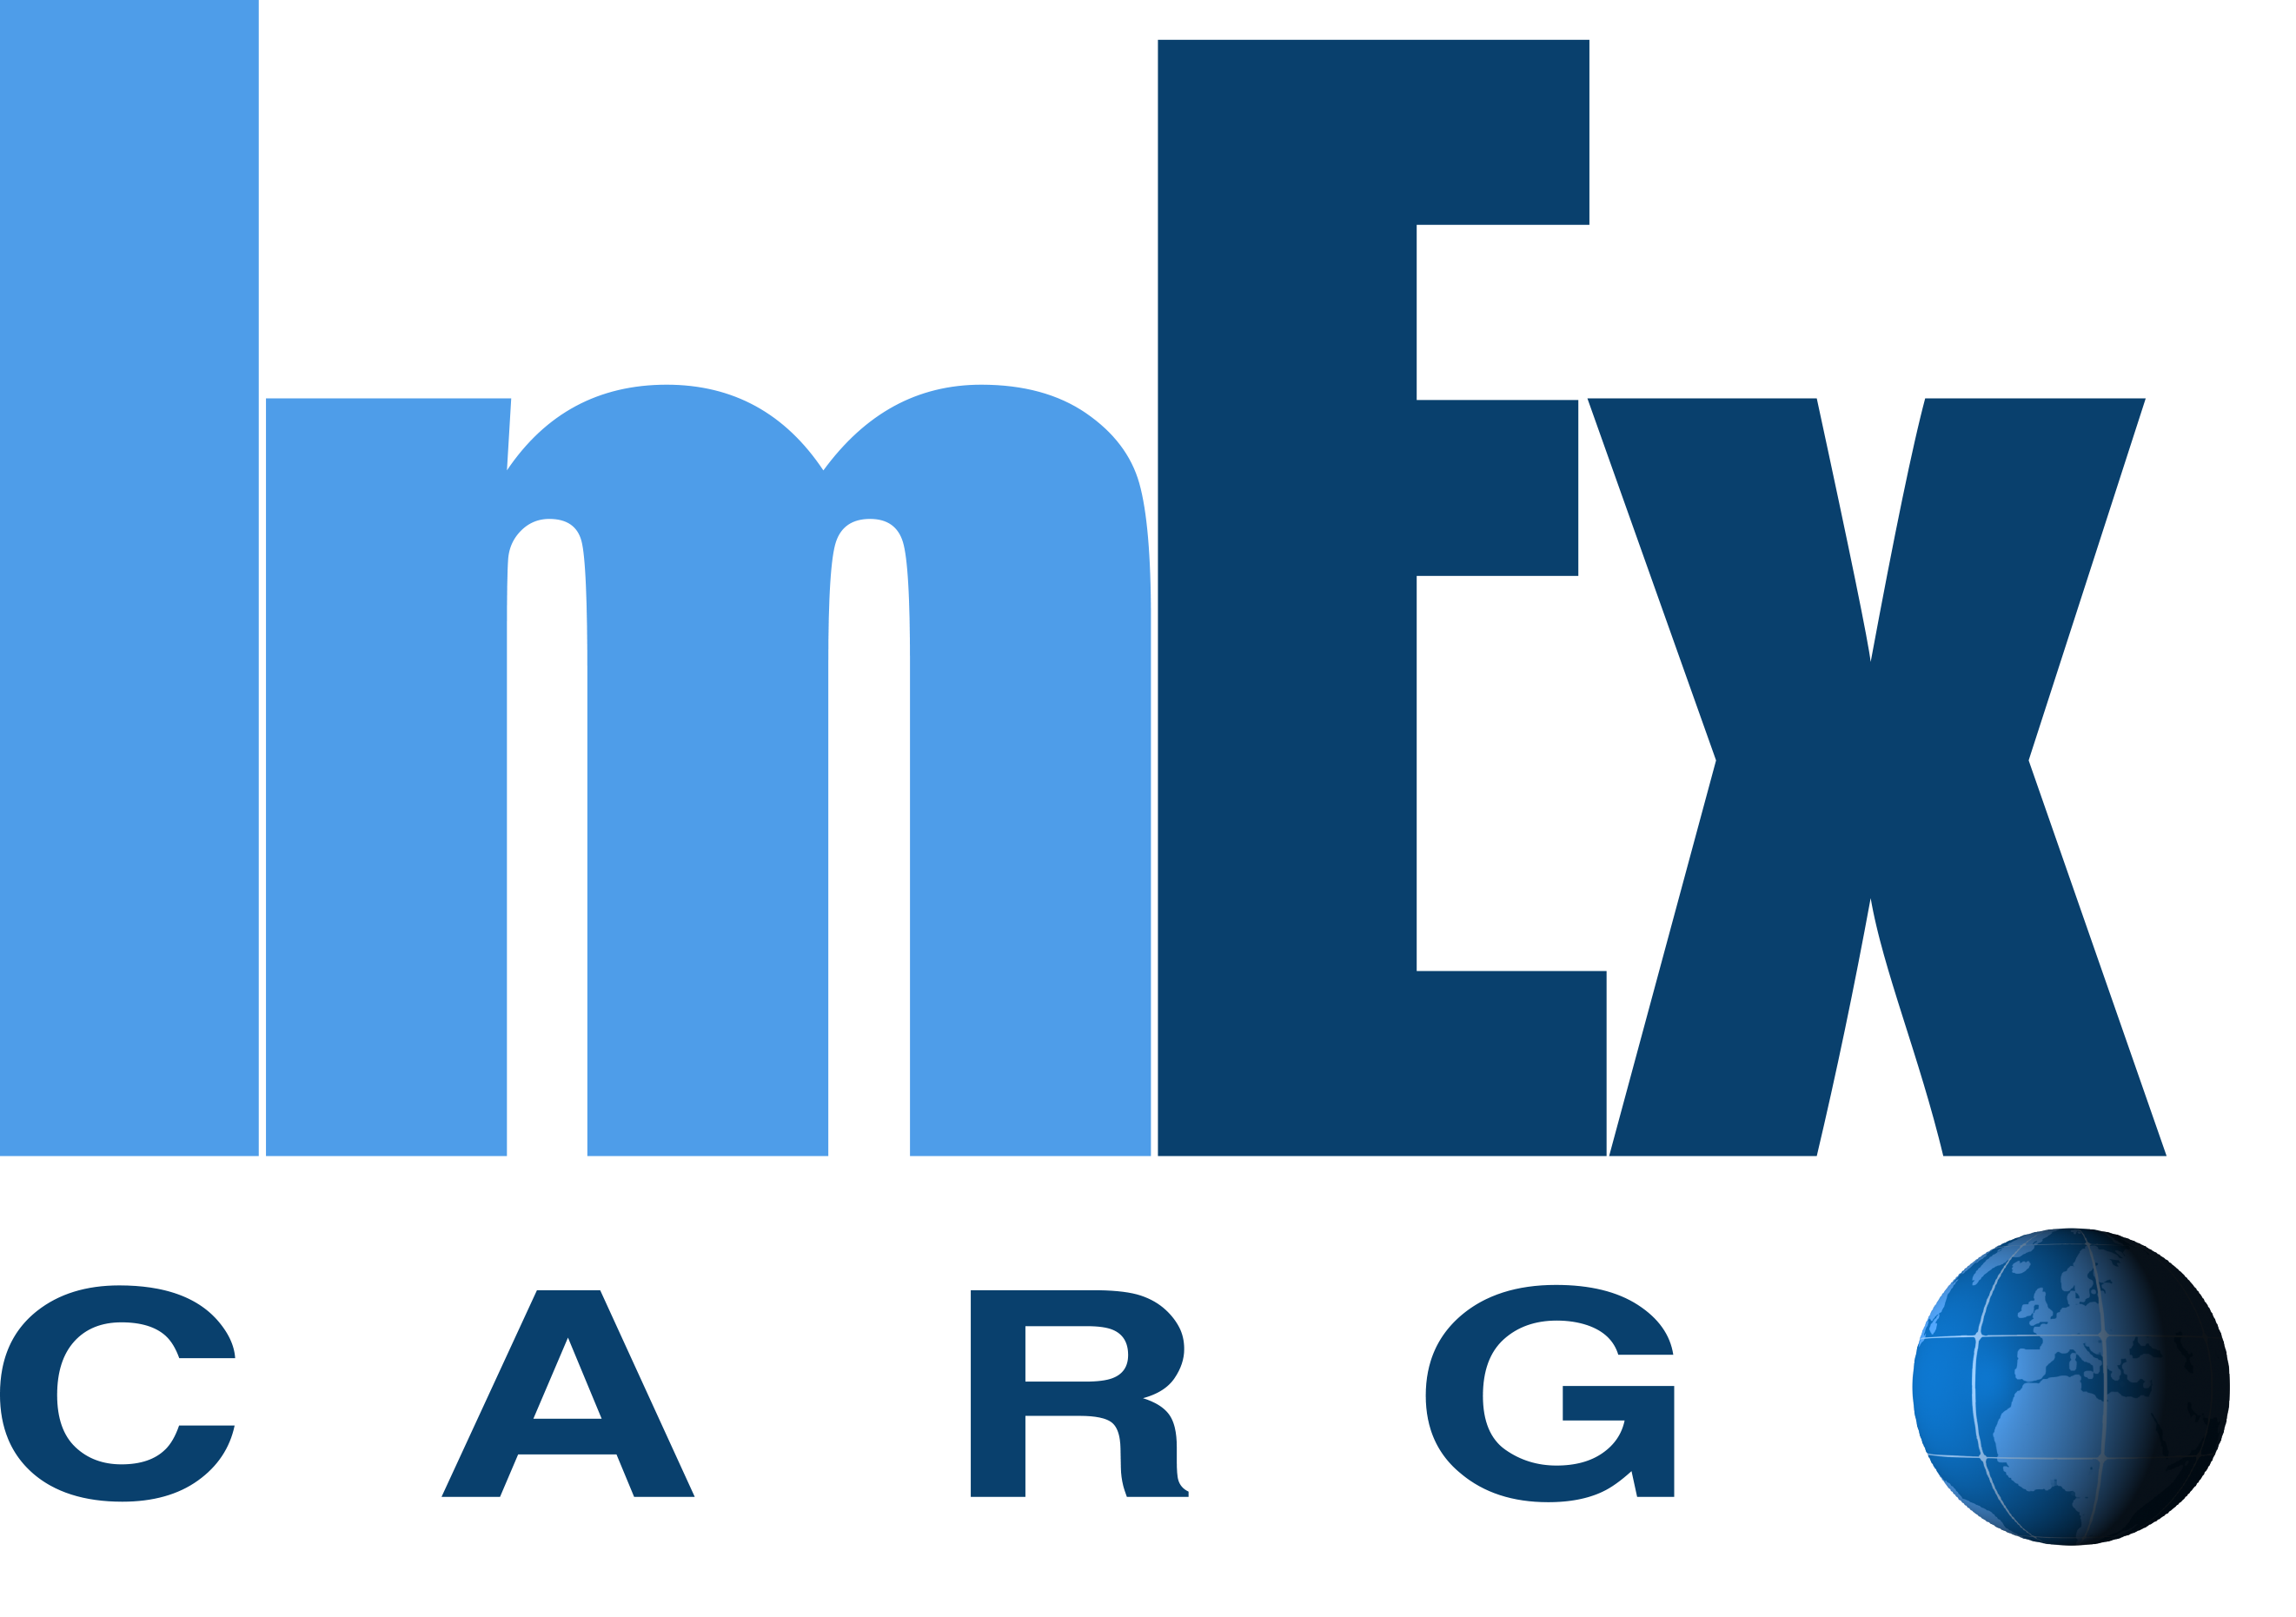 imexcargo.com